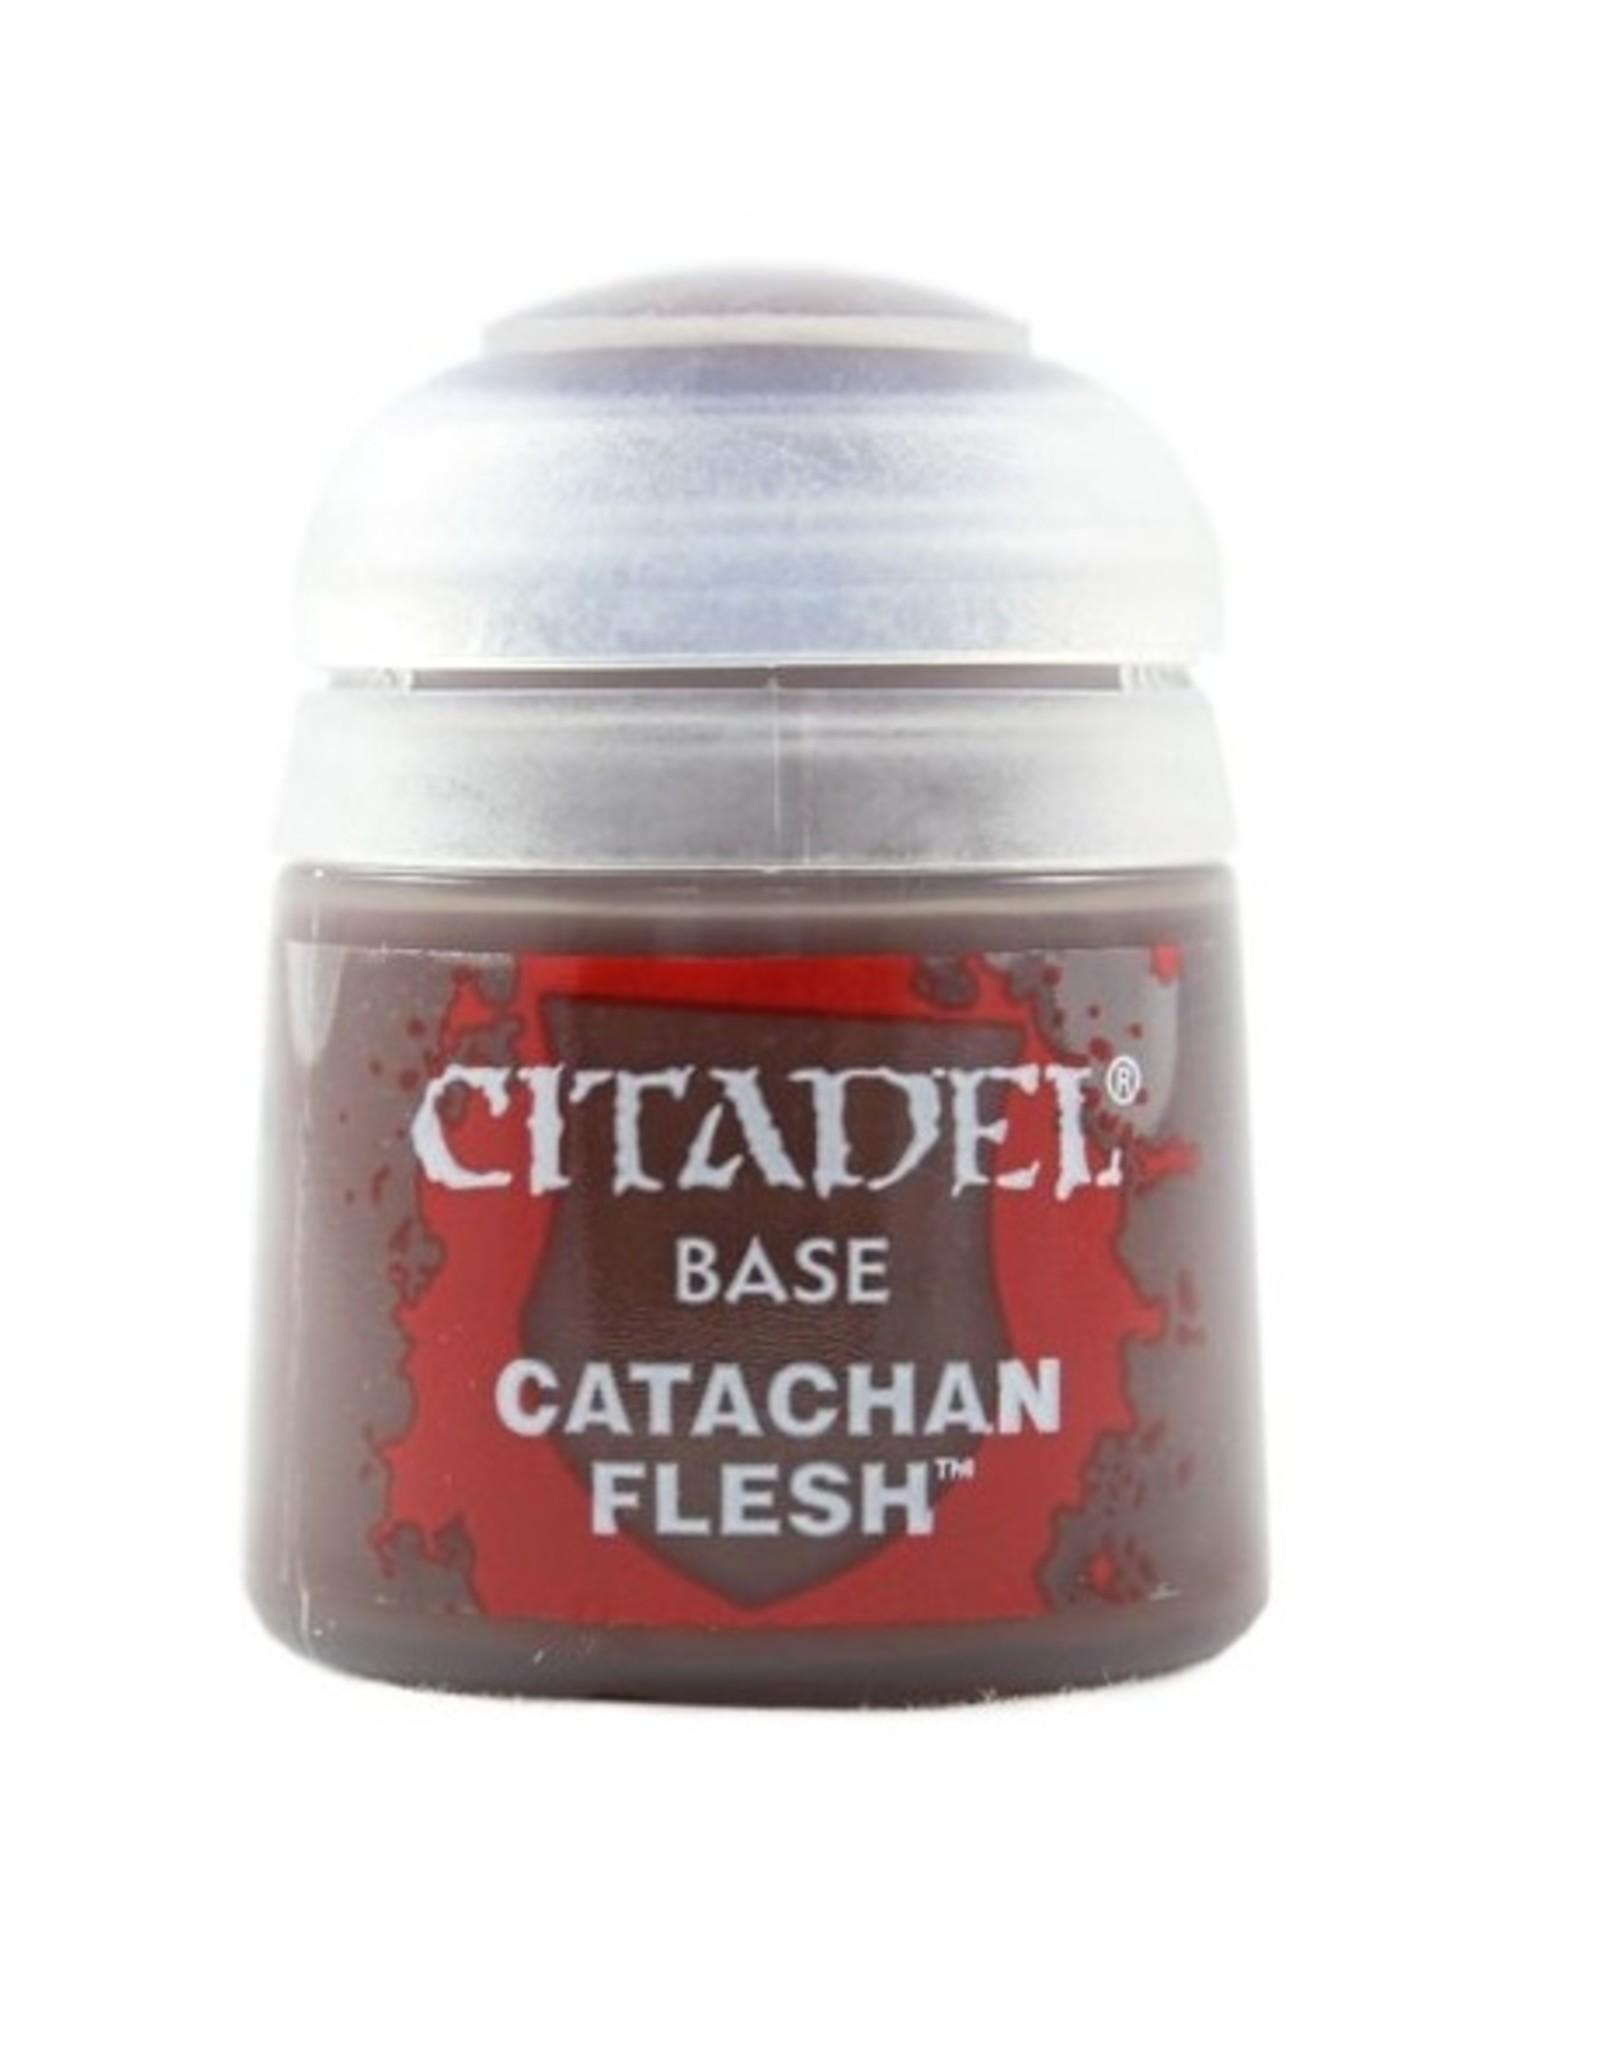 Citadel Citadel Base: Catachan Fleshtone (12ml)